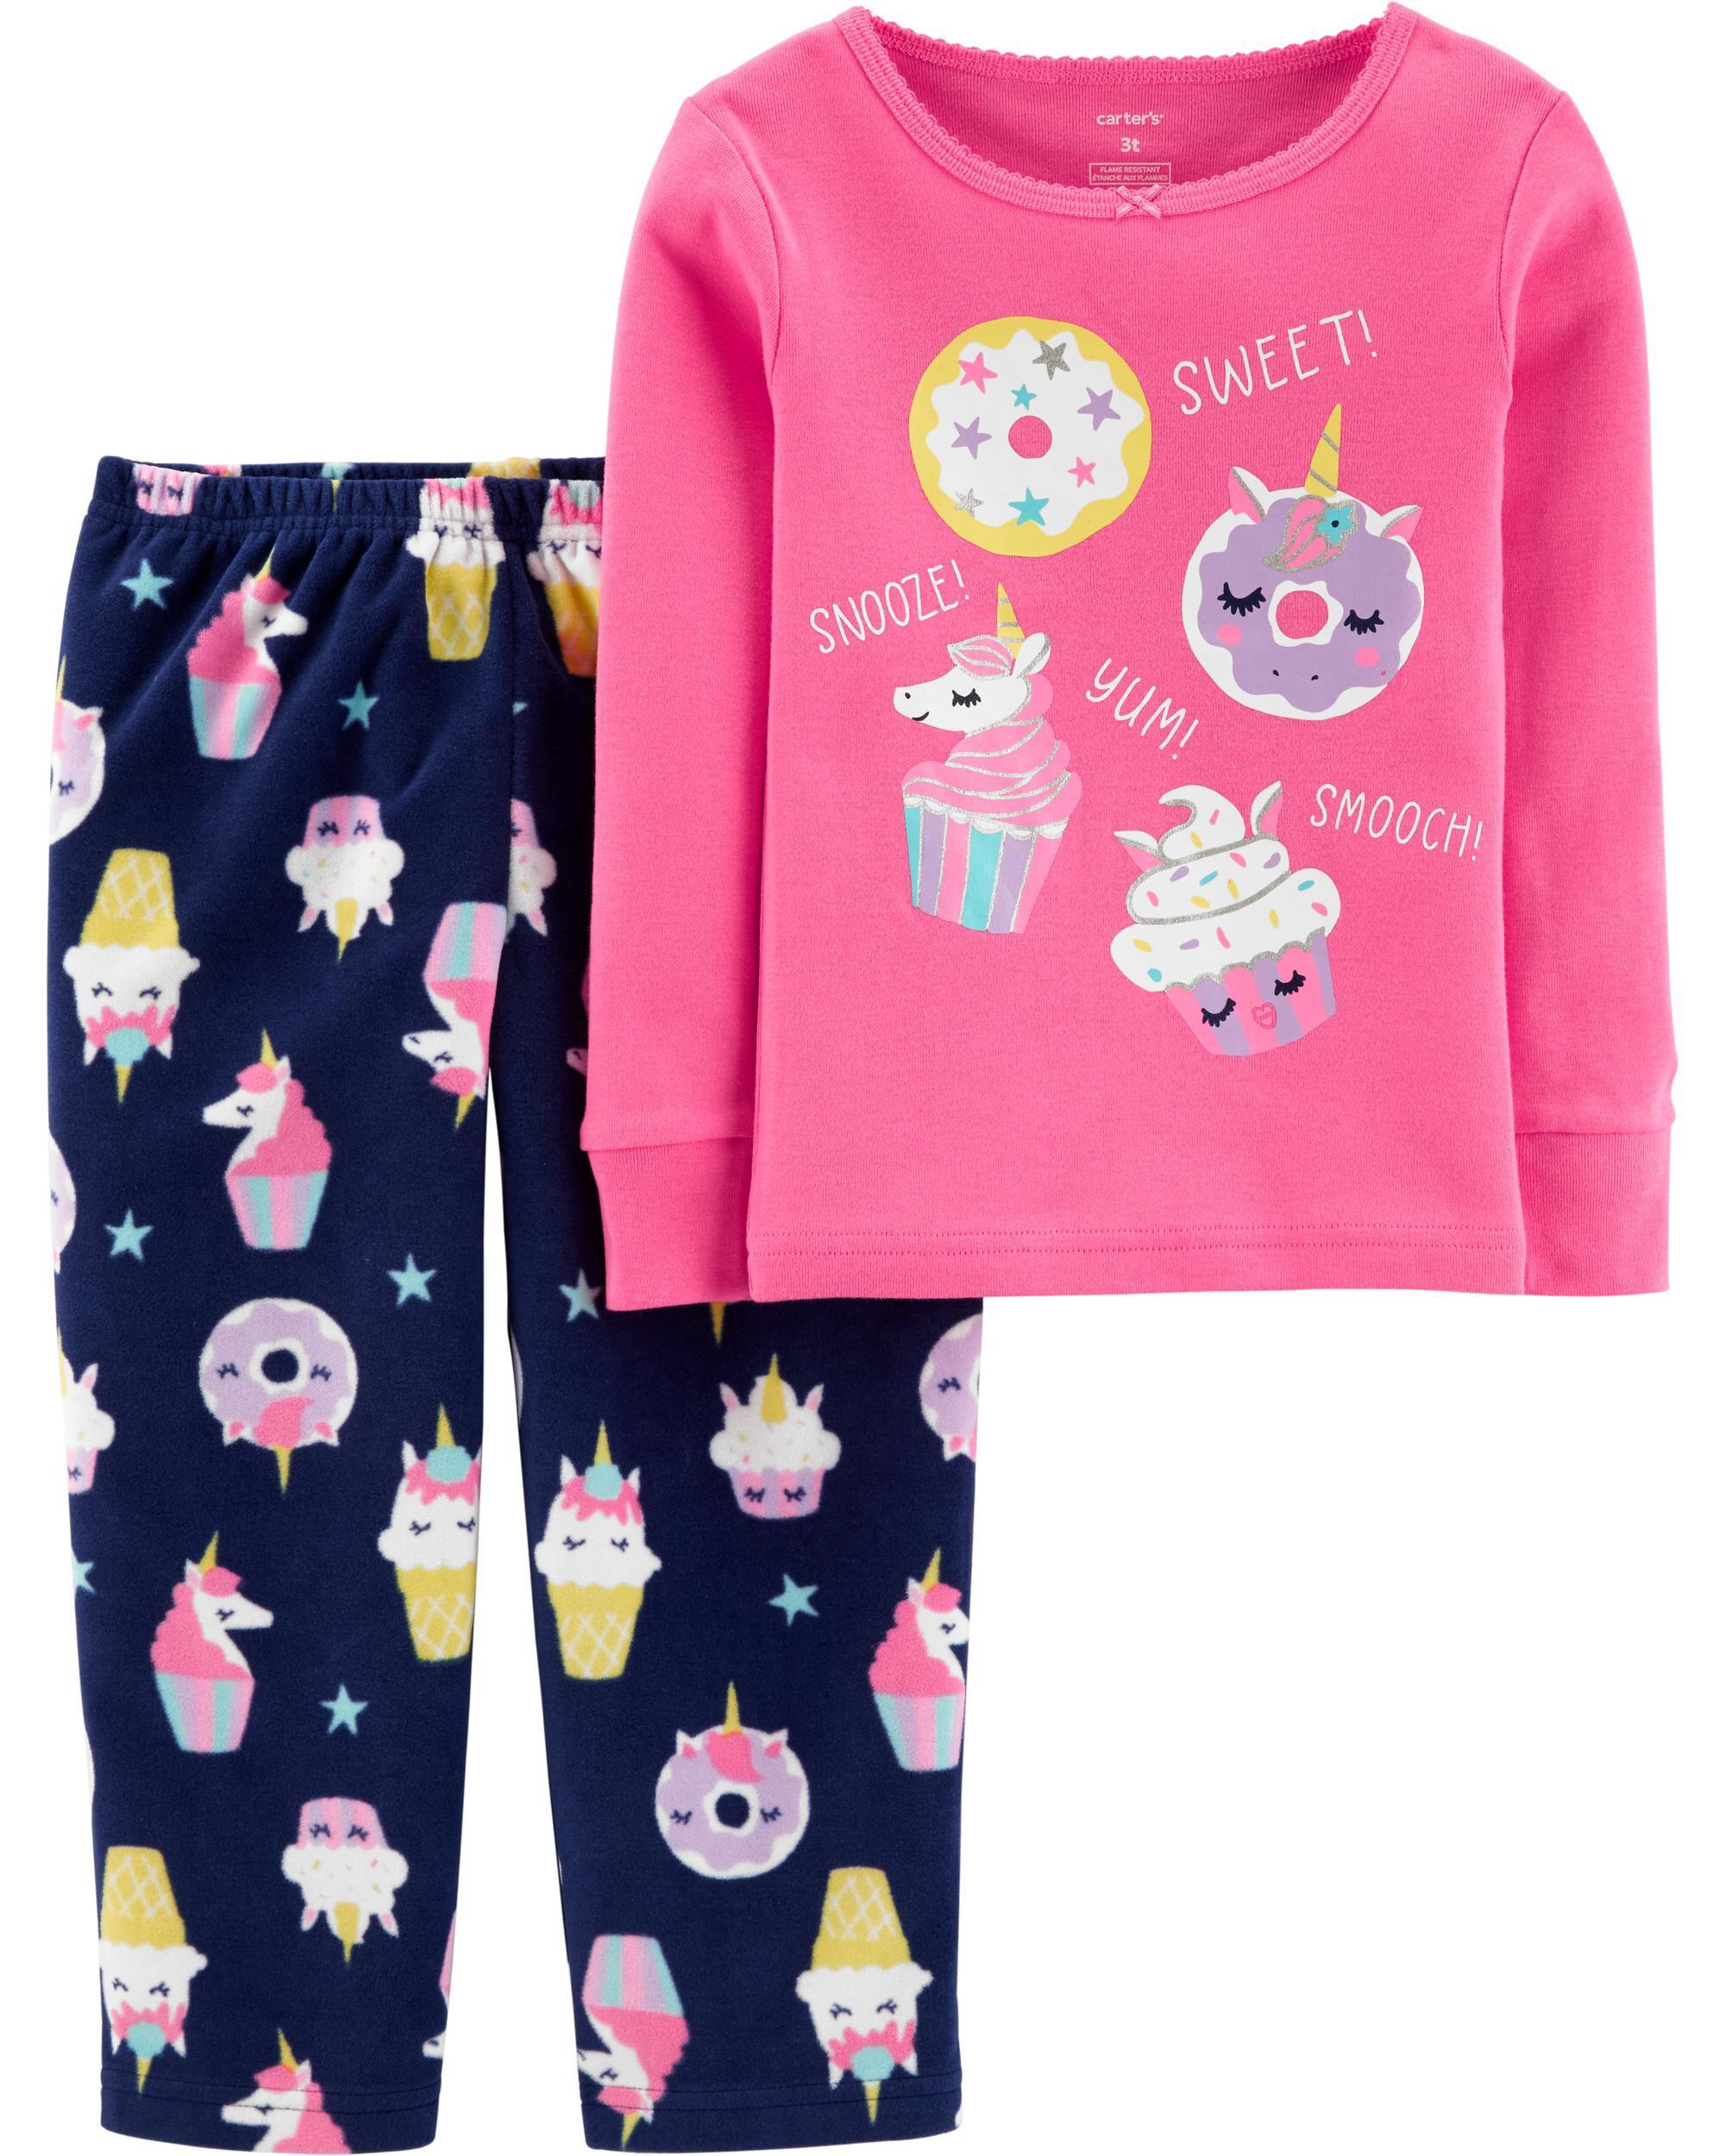 *CLEARANCE* 2-Piece Sweets Snug Fit Cotton & Fleece PJs